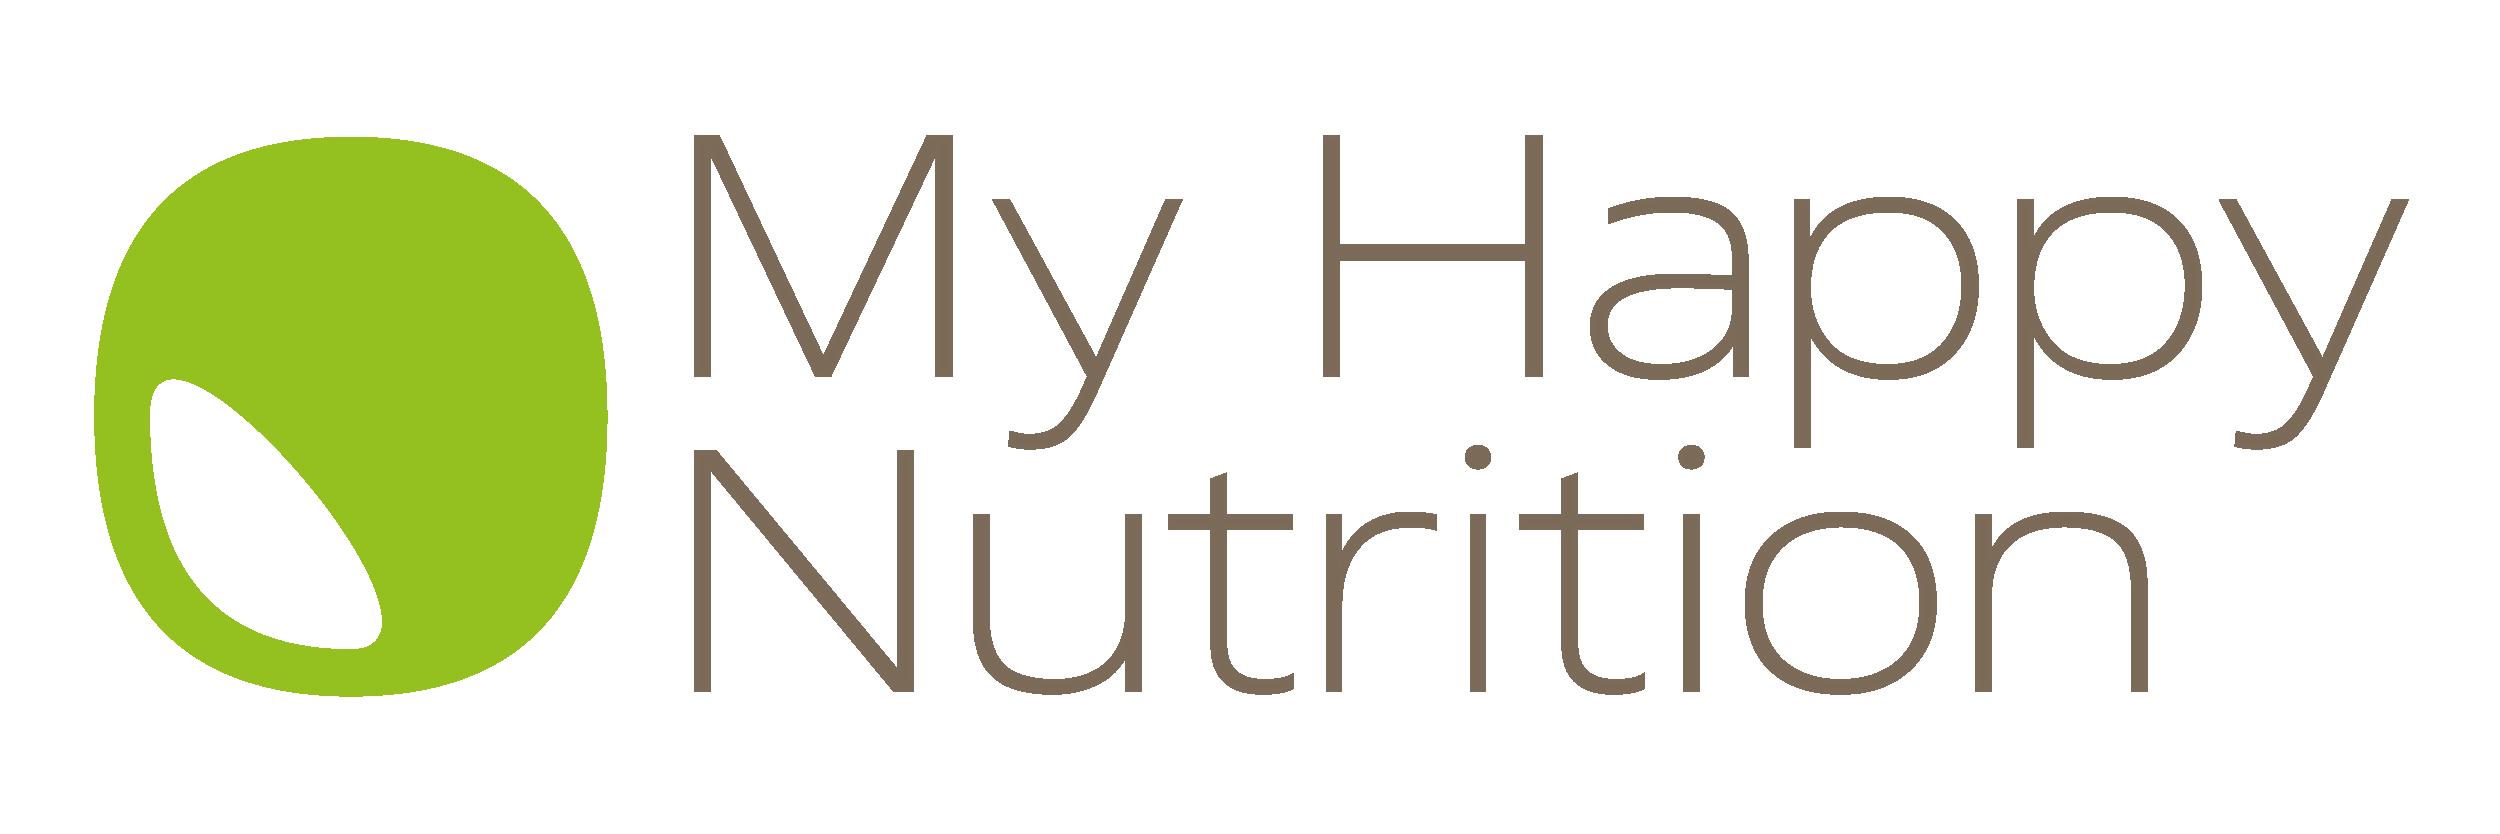 My Happy Nutrition